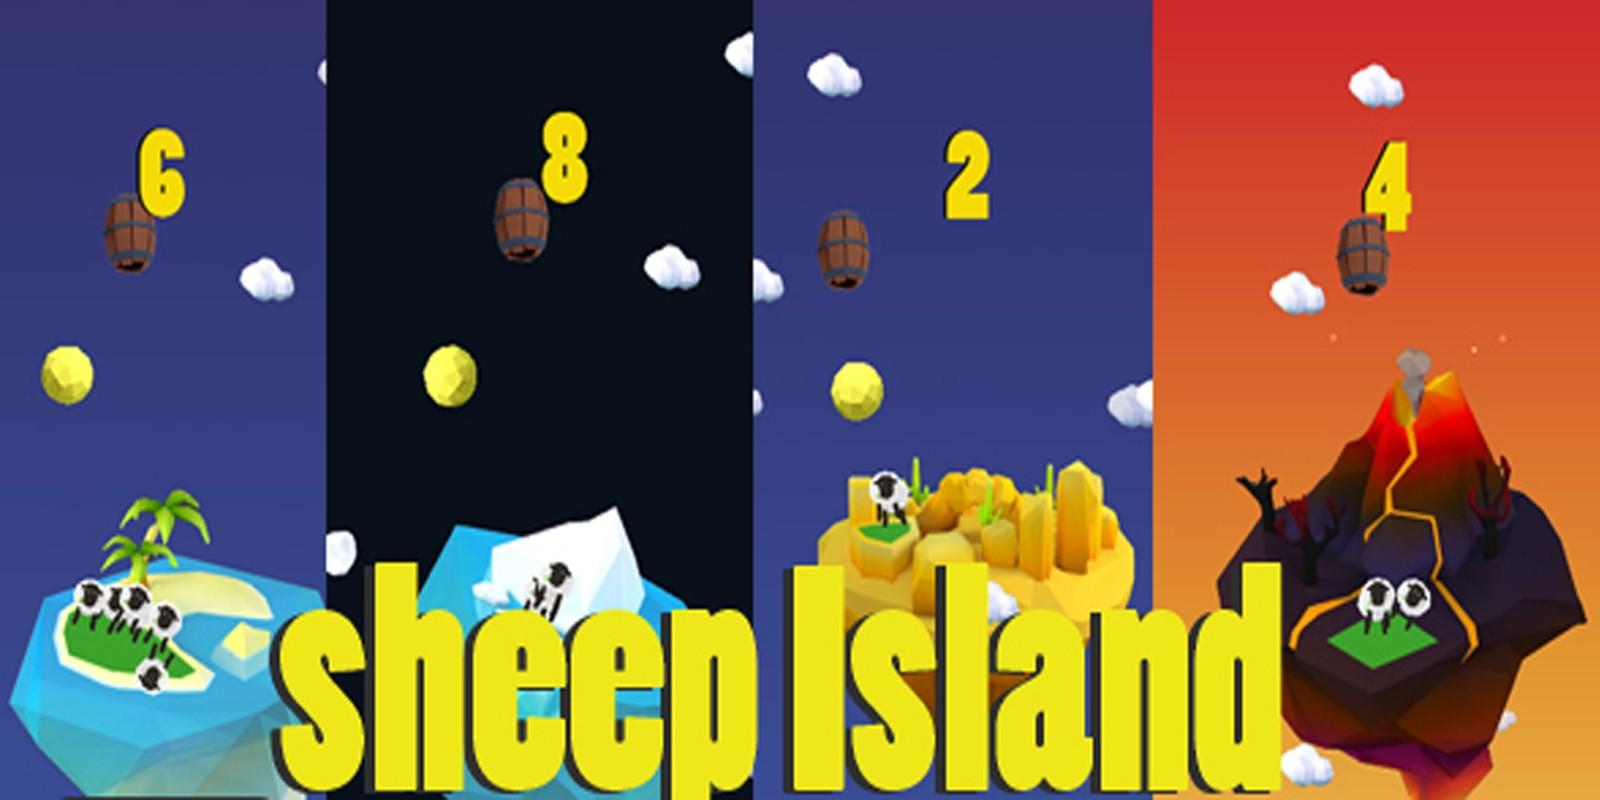 Sheep Island - Buildbox Template